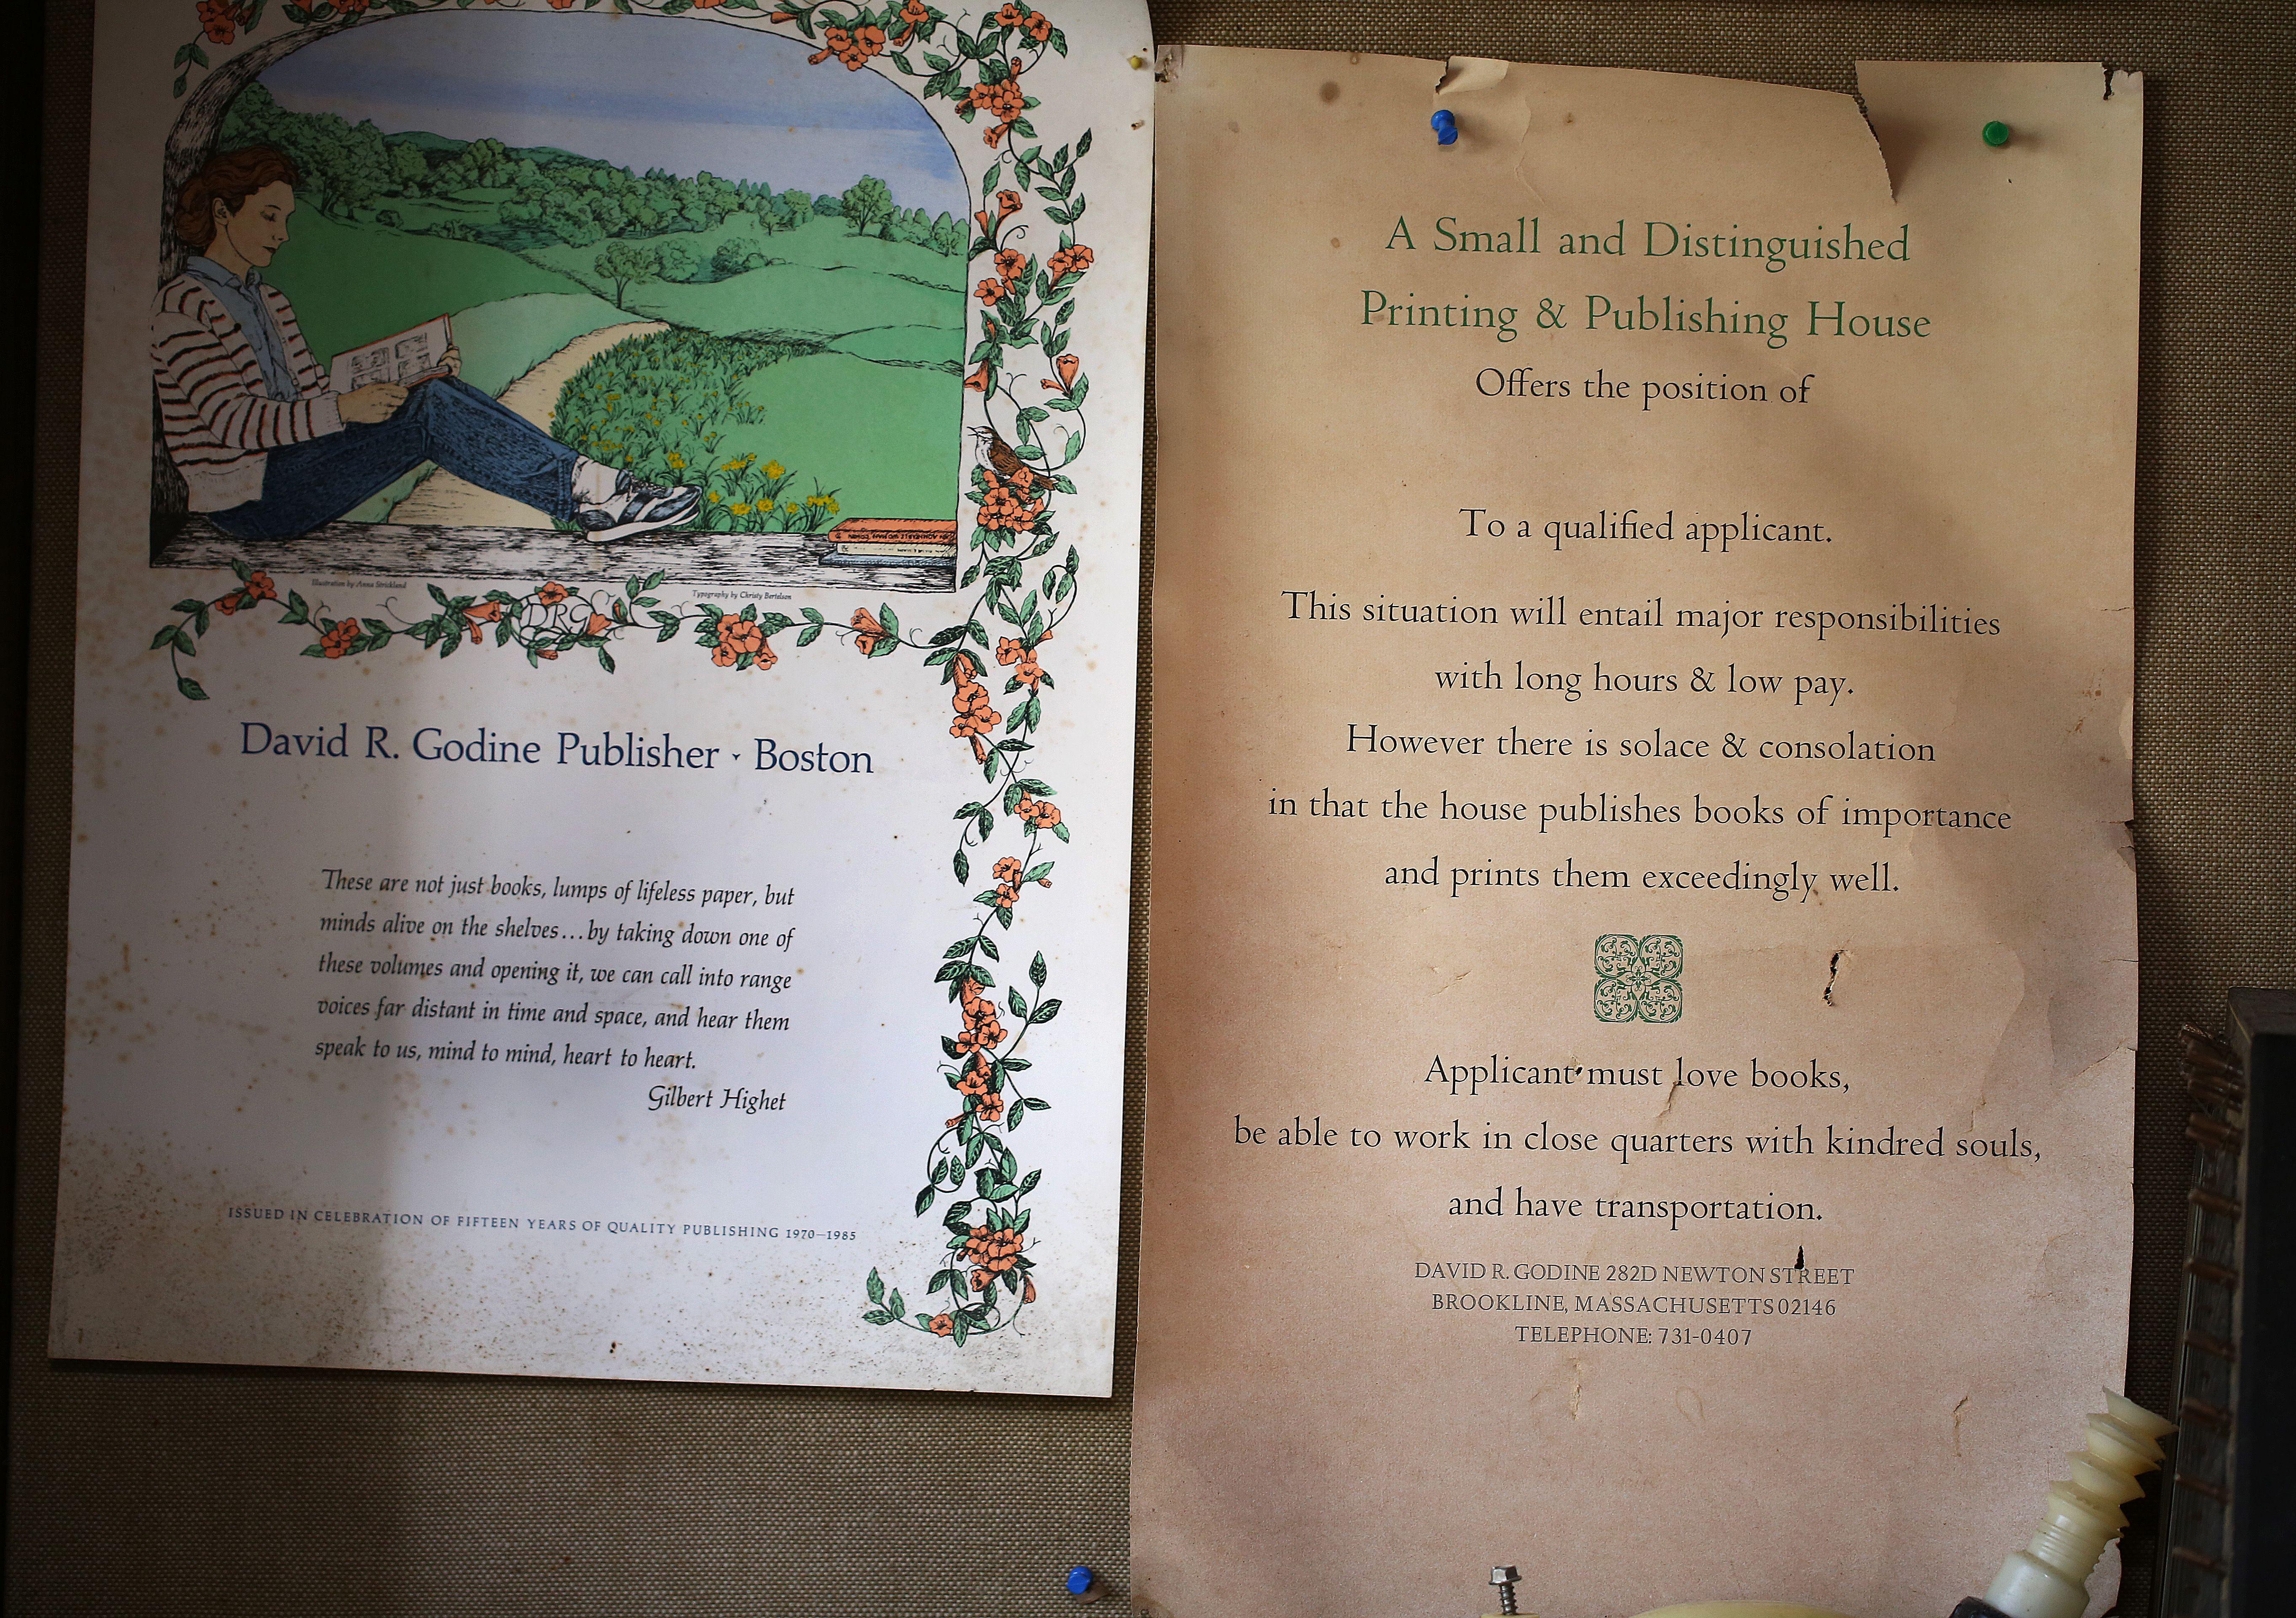 Beyond sales, Boston publisher's devotion speaks volumes